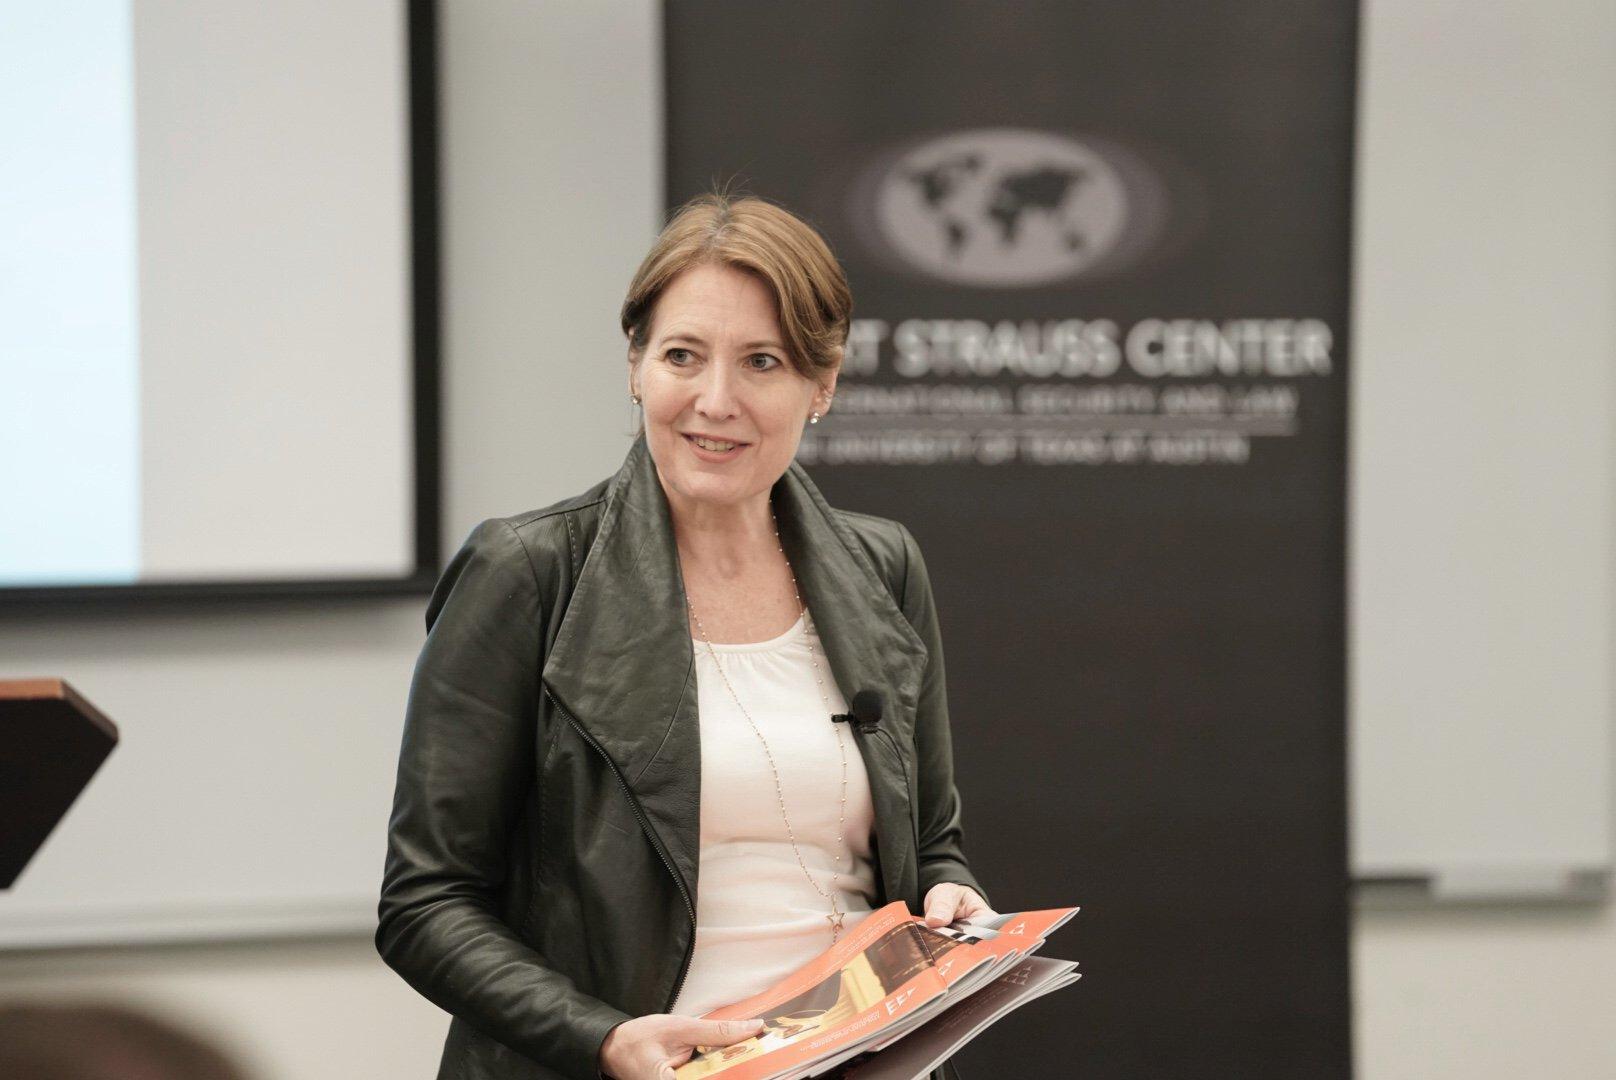 Diwan at Strauss Center